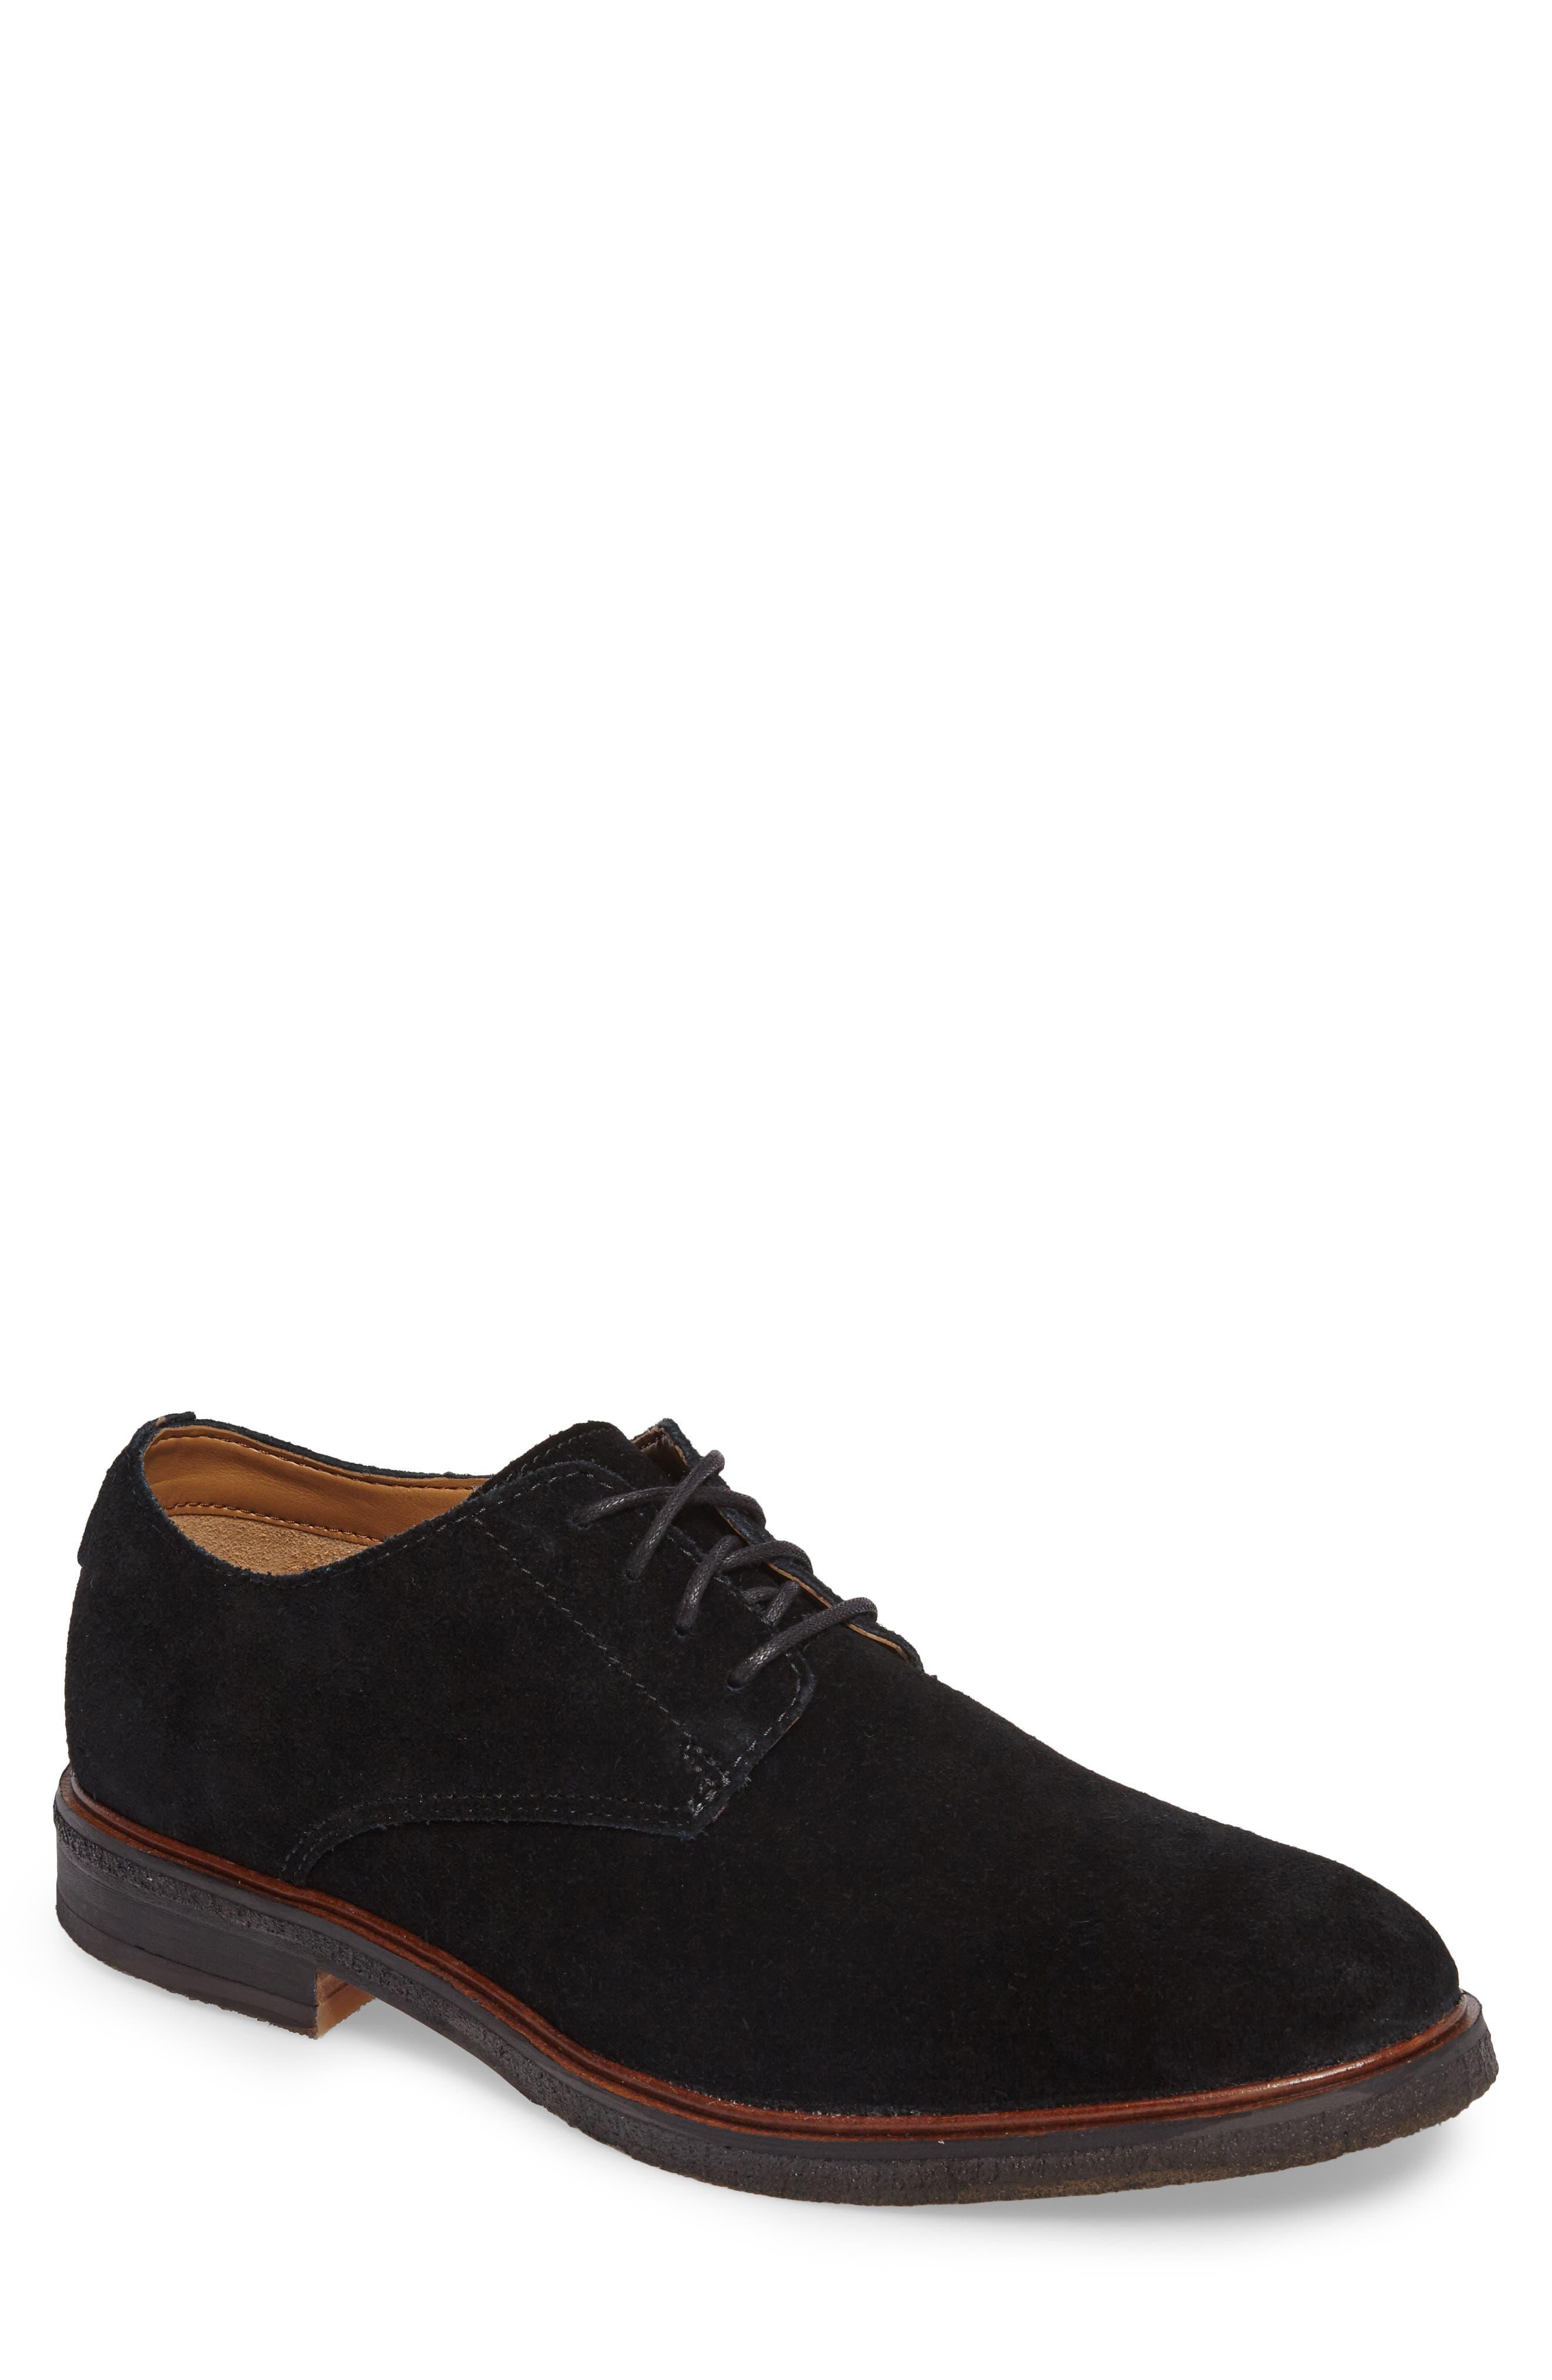 Clarks Clarkdale Moon Buck Shoe,                         Main,                         color,